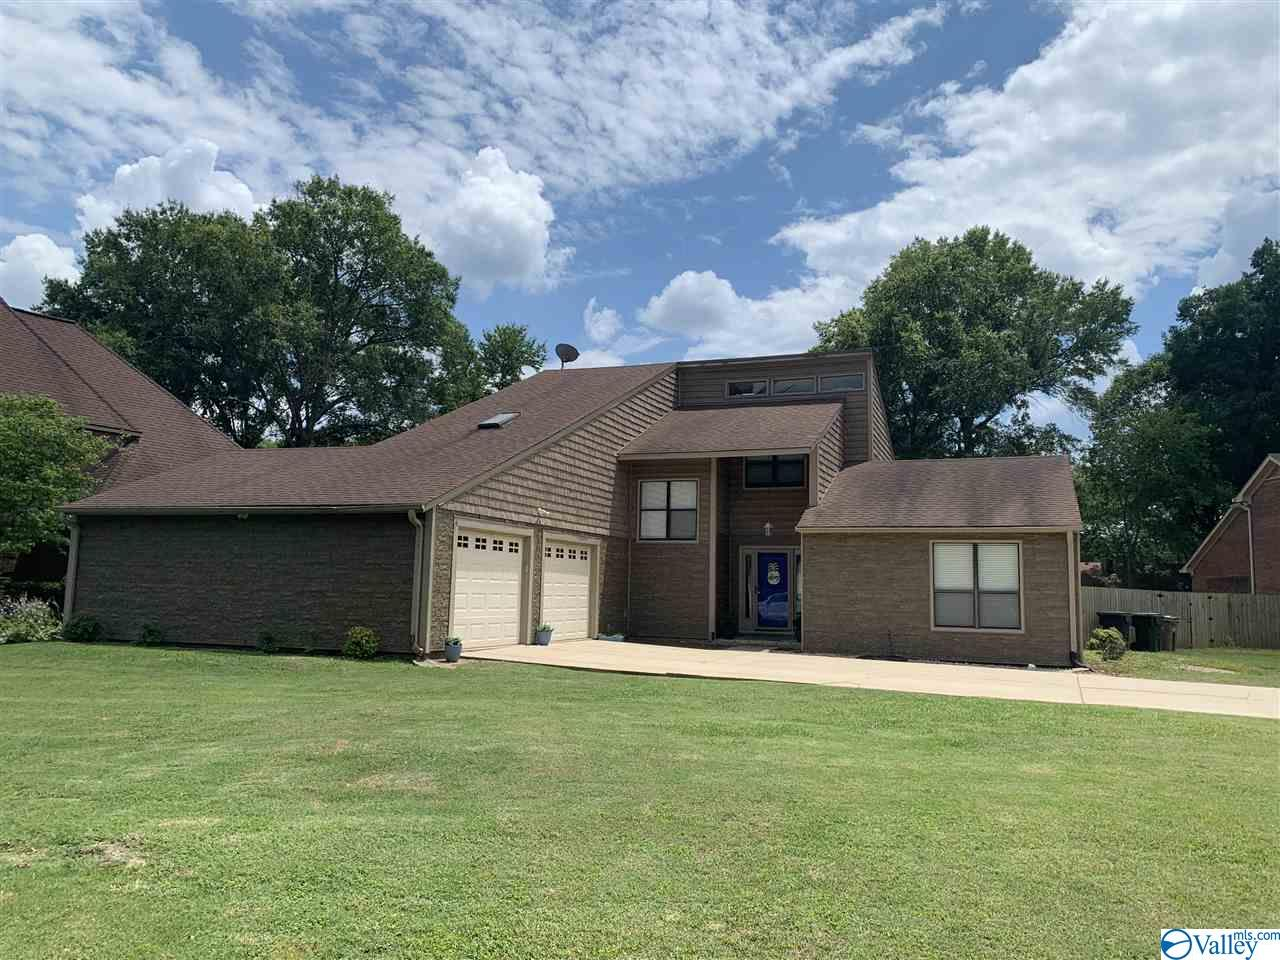 Photo of home for sale at 1319 Regency Blvd, Decatur AL